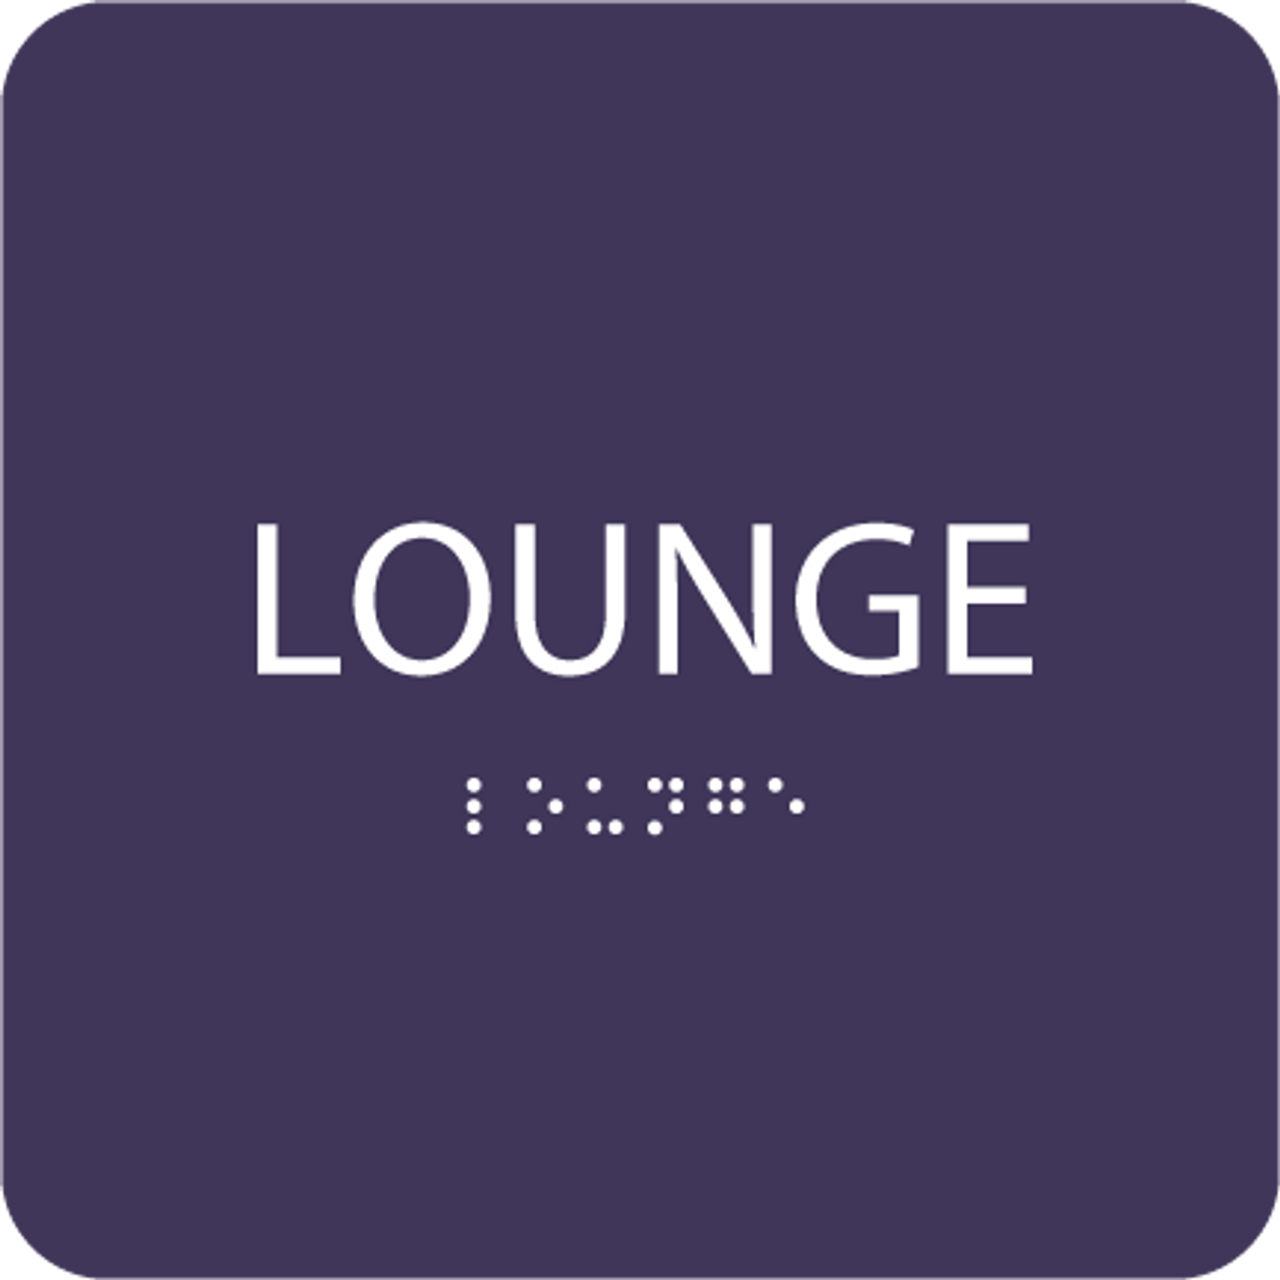 Purple Lounge ADA Sign